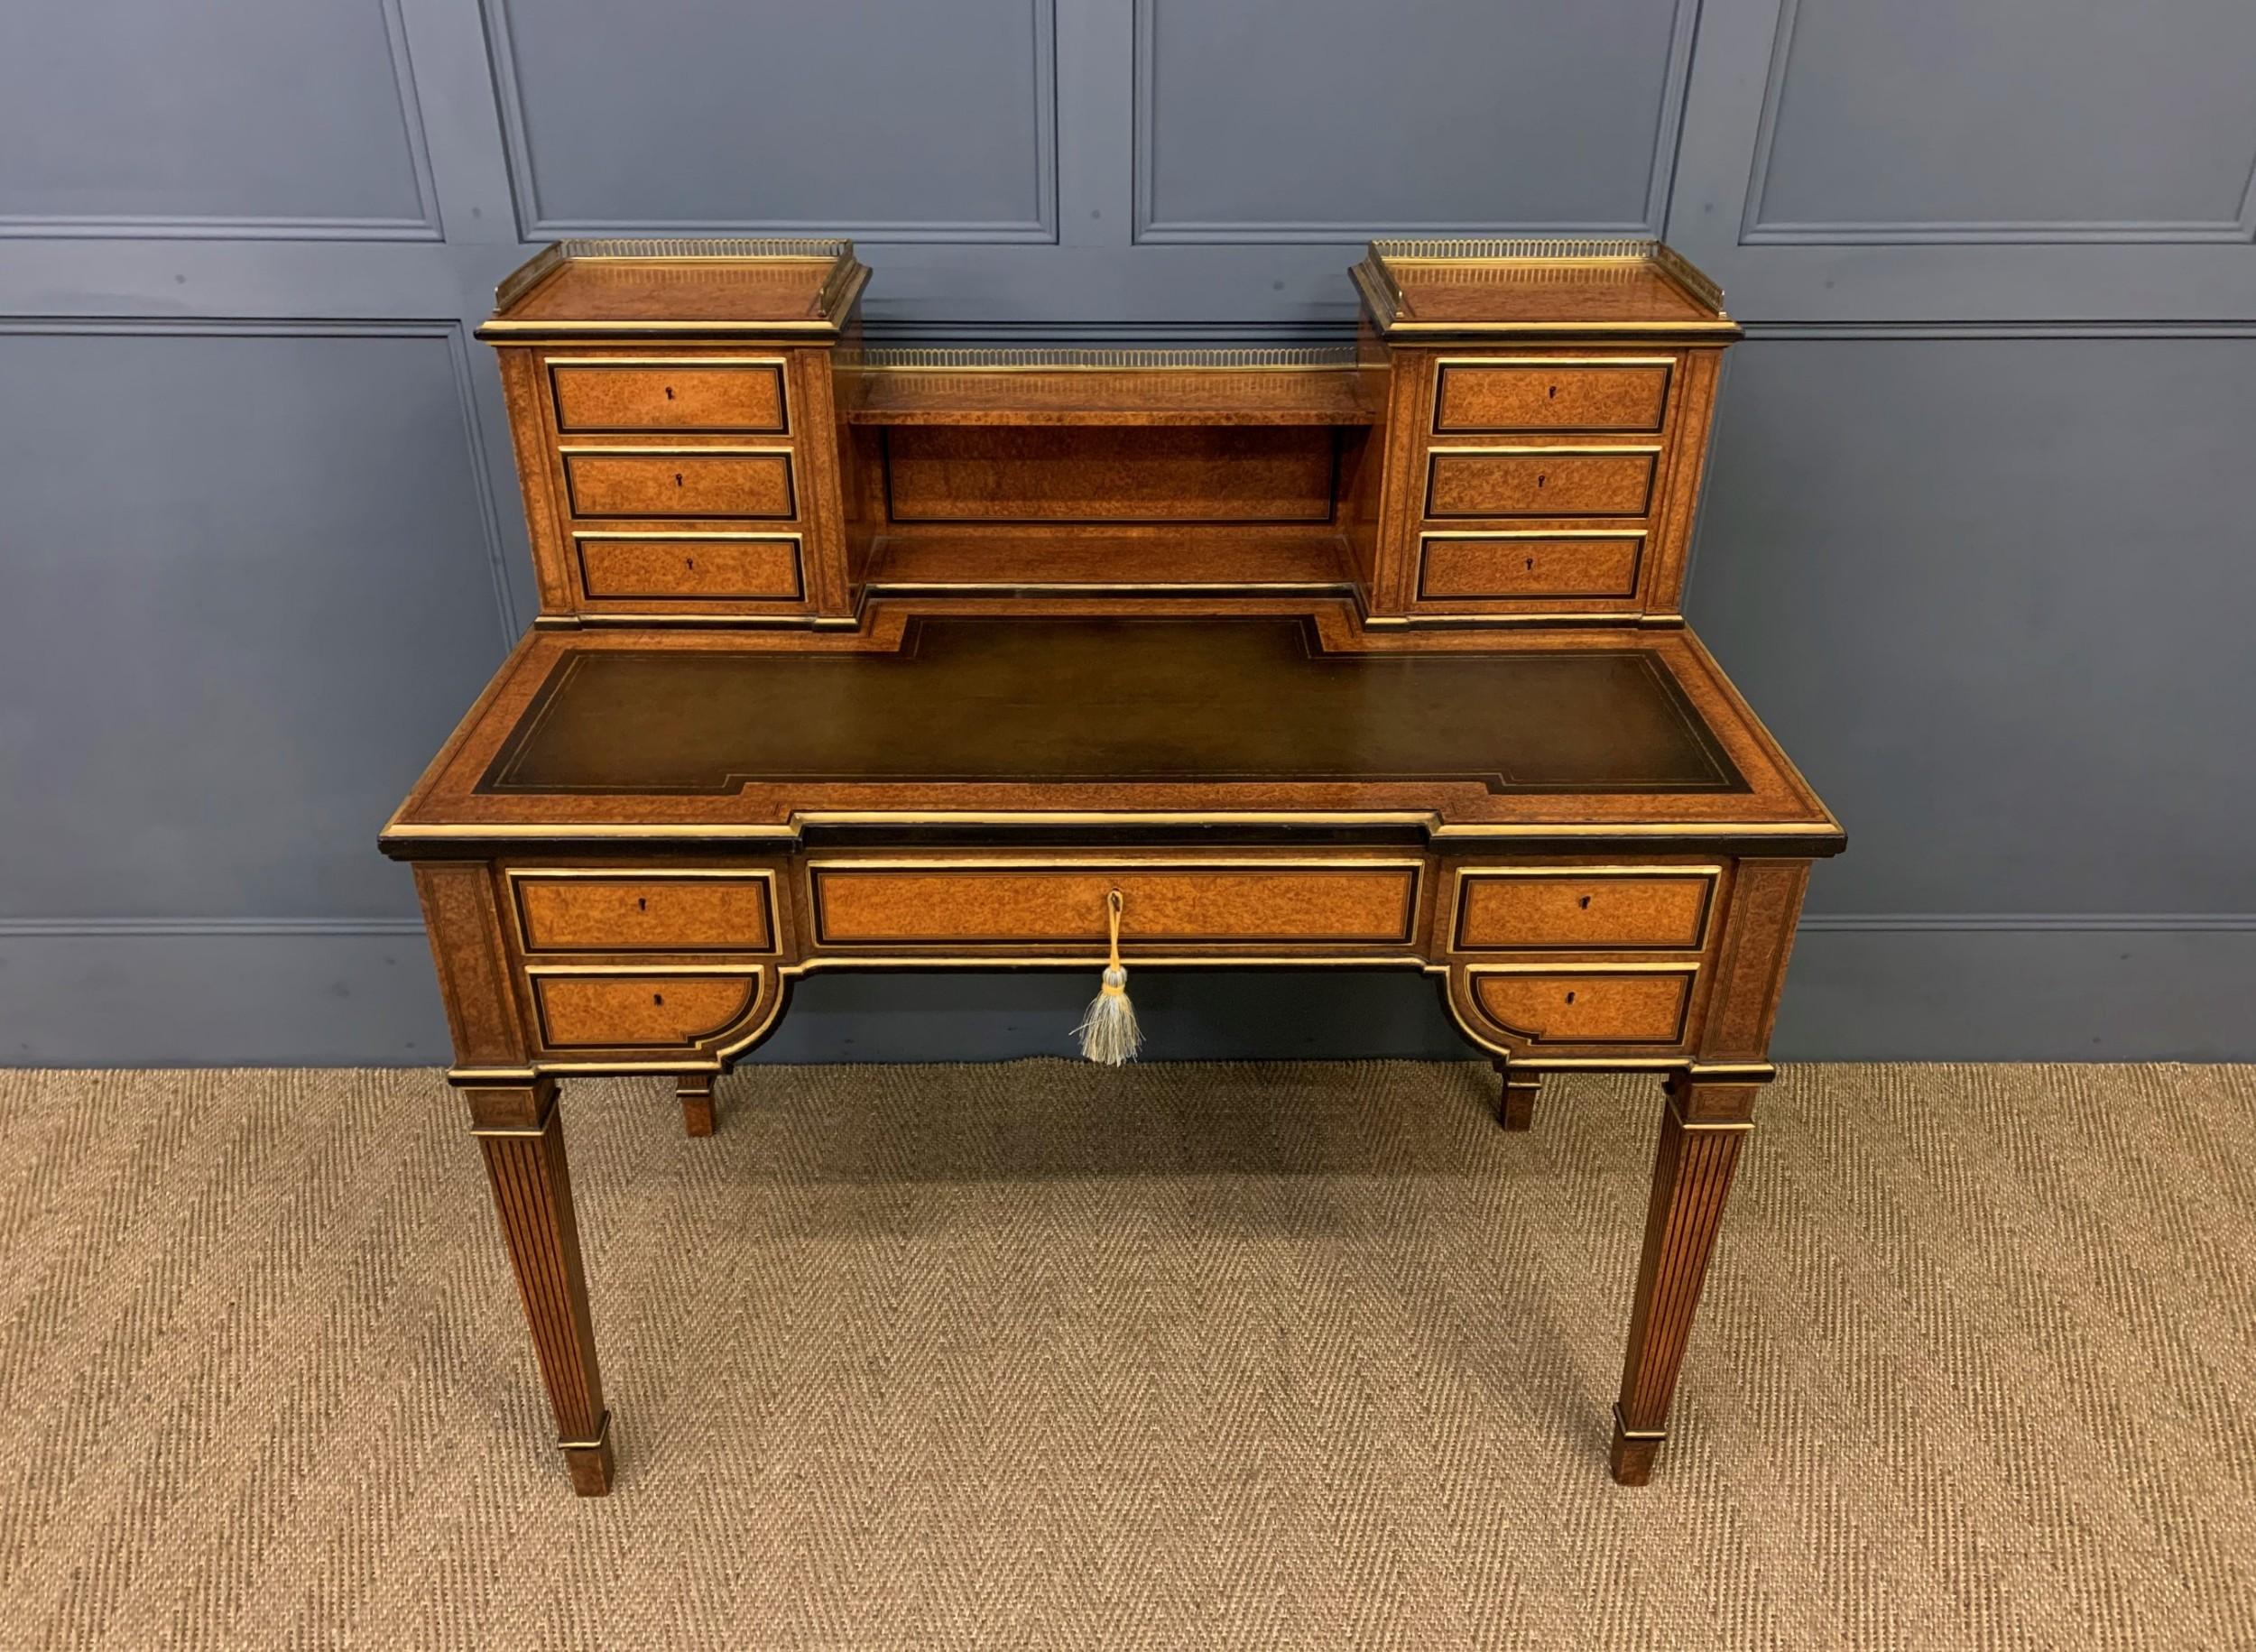 19th century amboyna writing desk